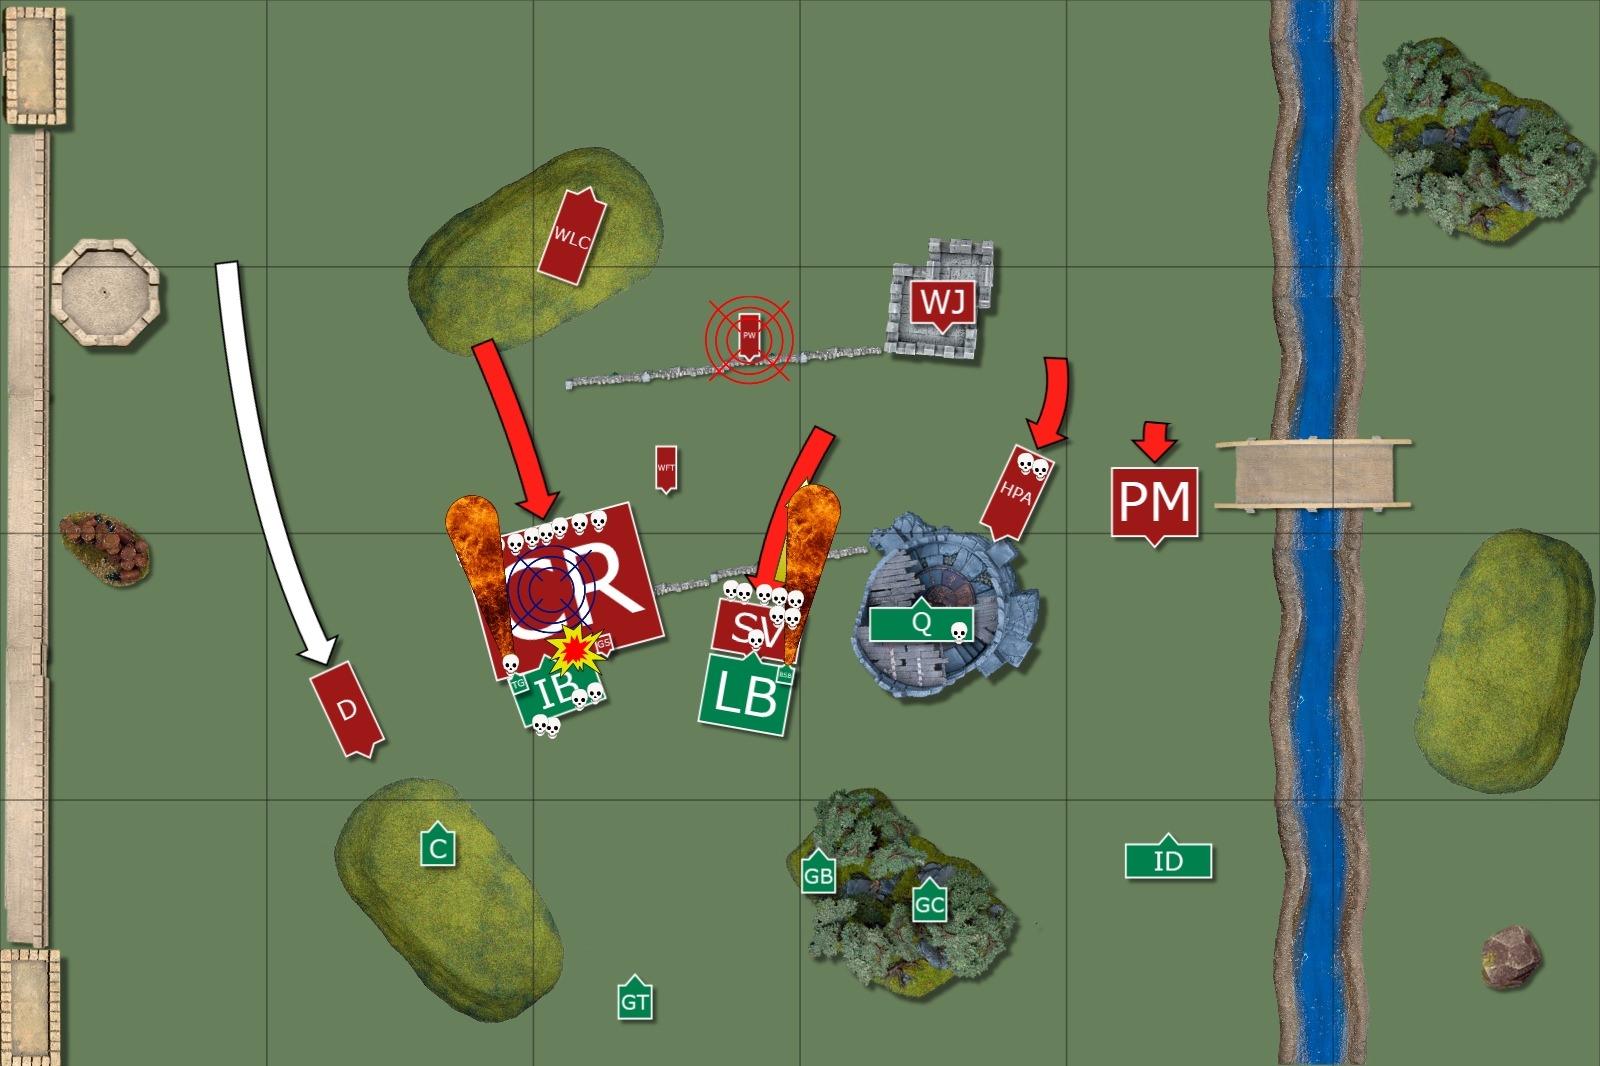 warhammer-fantasy-8th-edition-battle-report-dwarfs-skaven-turn-02